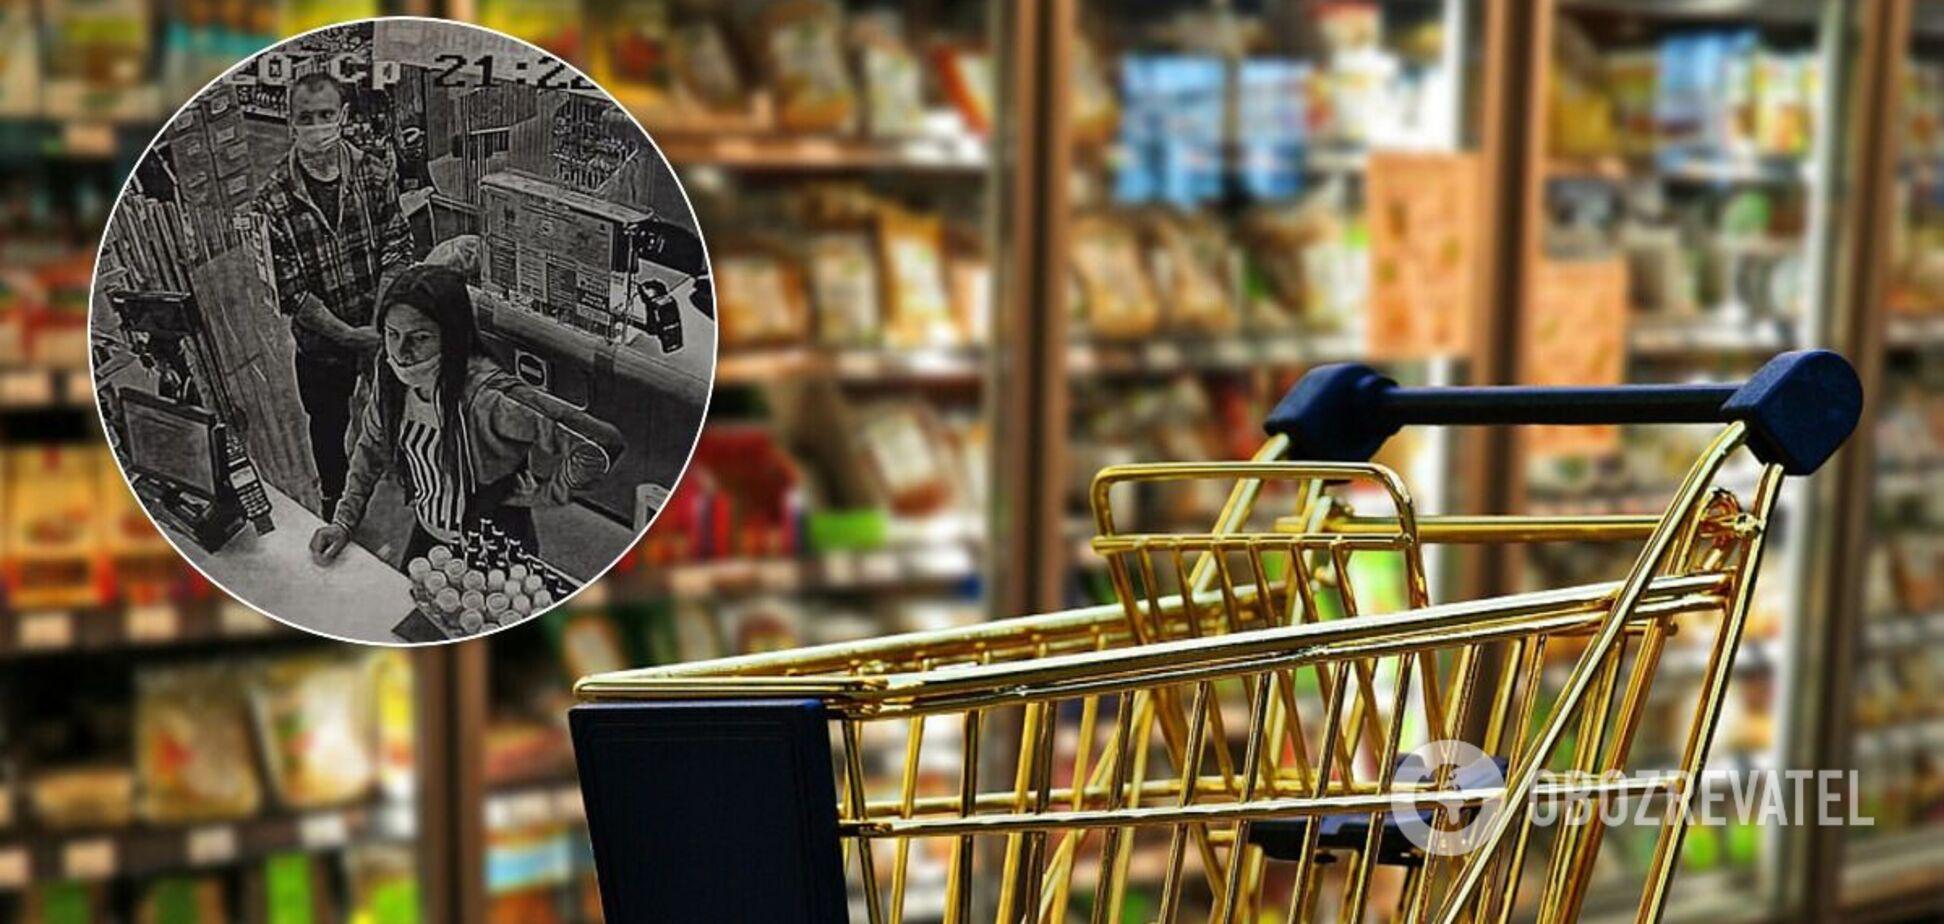 У київському супермаркеті побили покупця